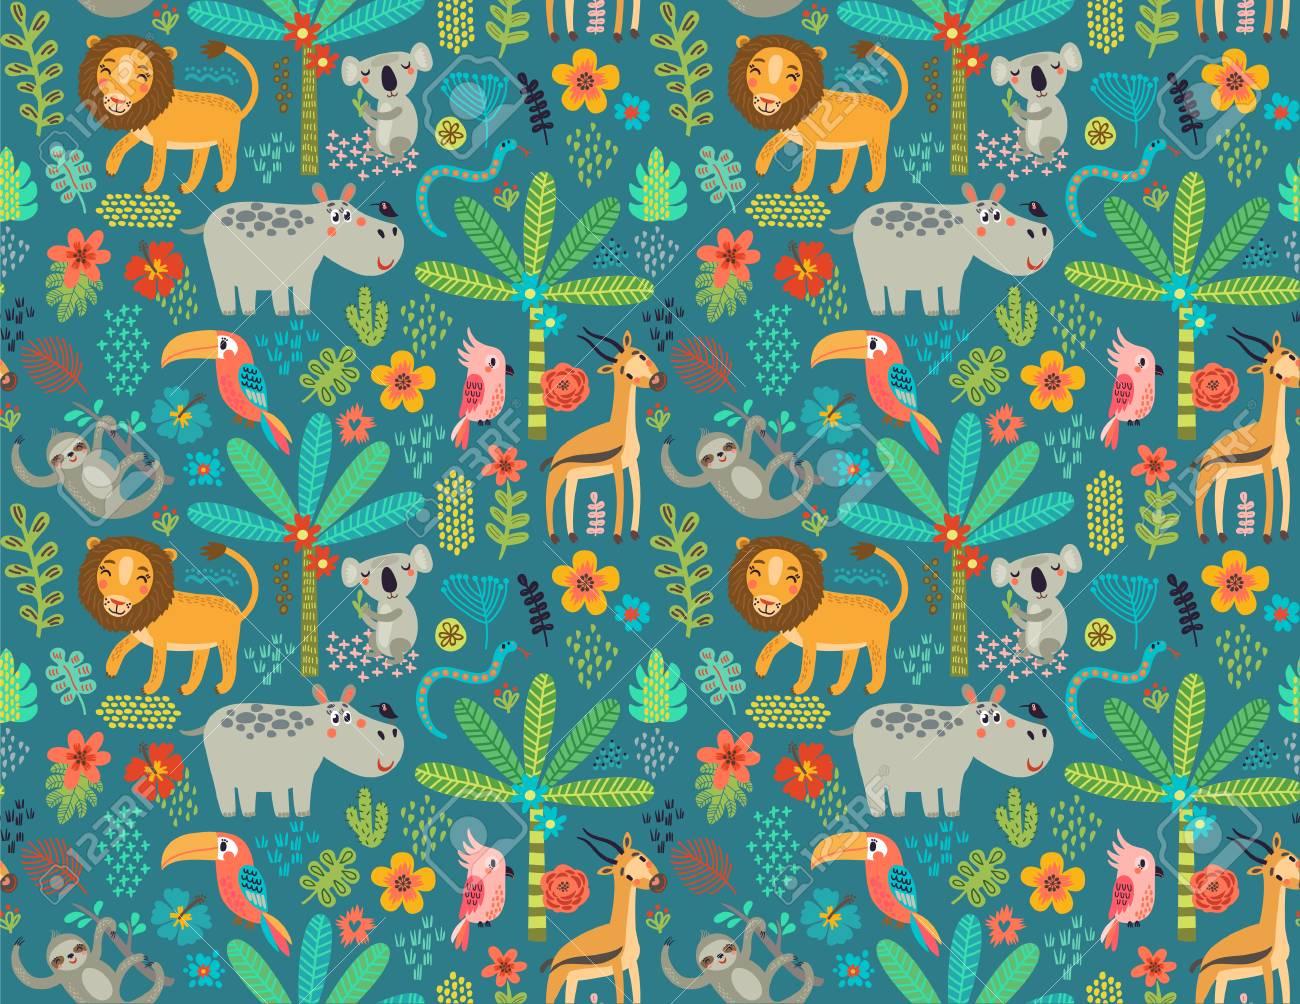 Seamless pattern with jungle animals - 77627476